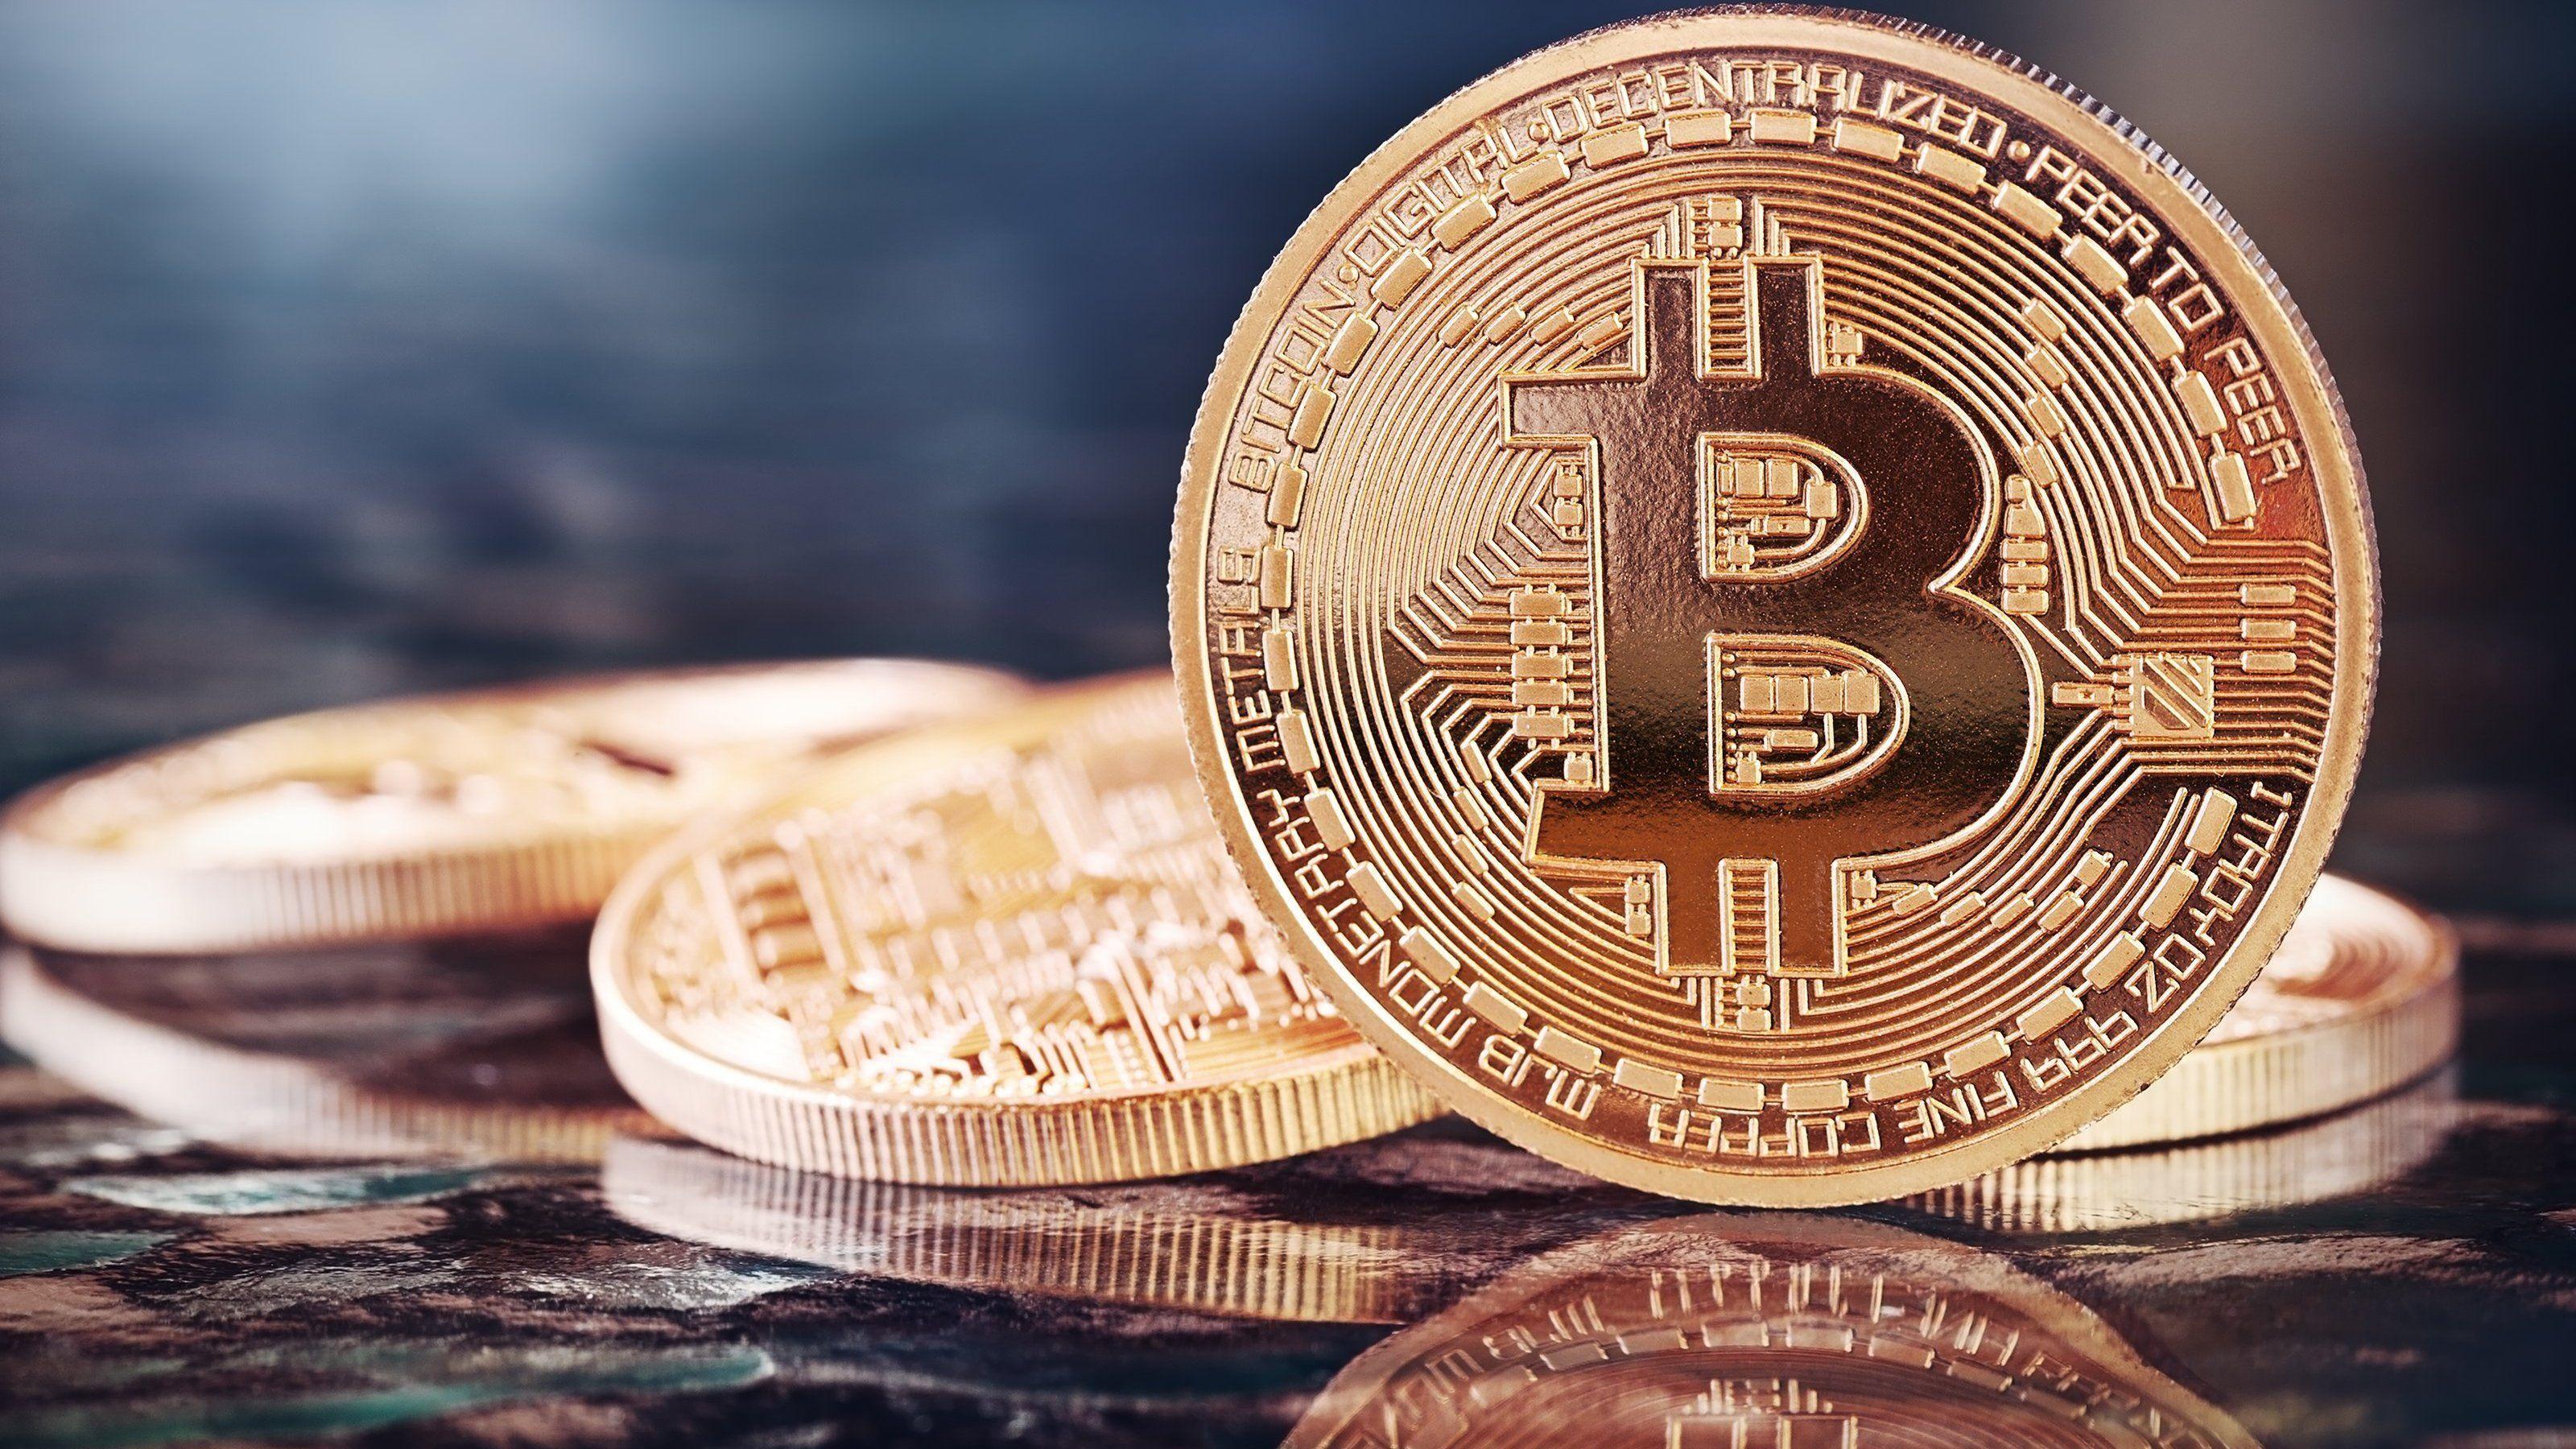 Slik skal de få fart på Bitcoin-valutaen